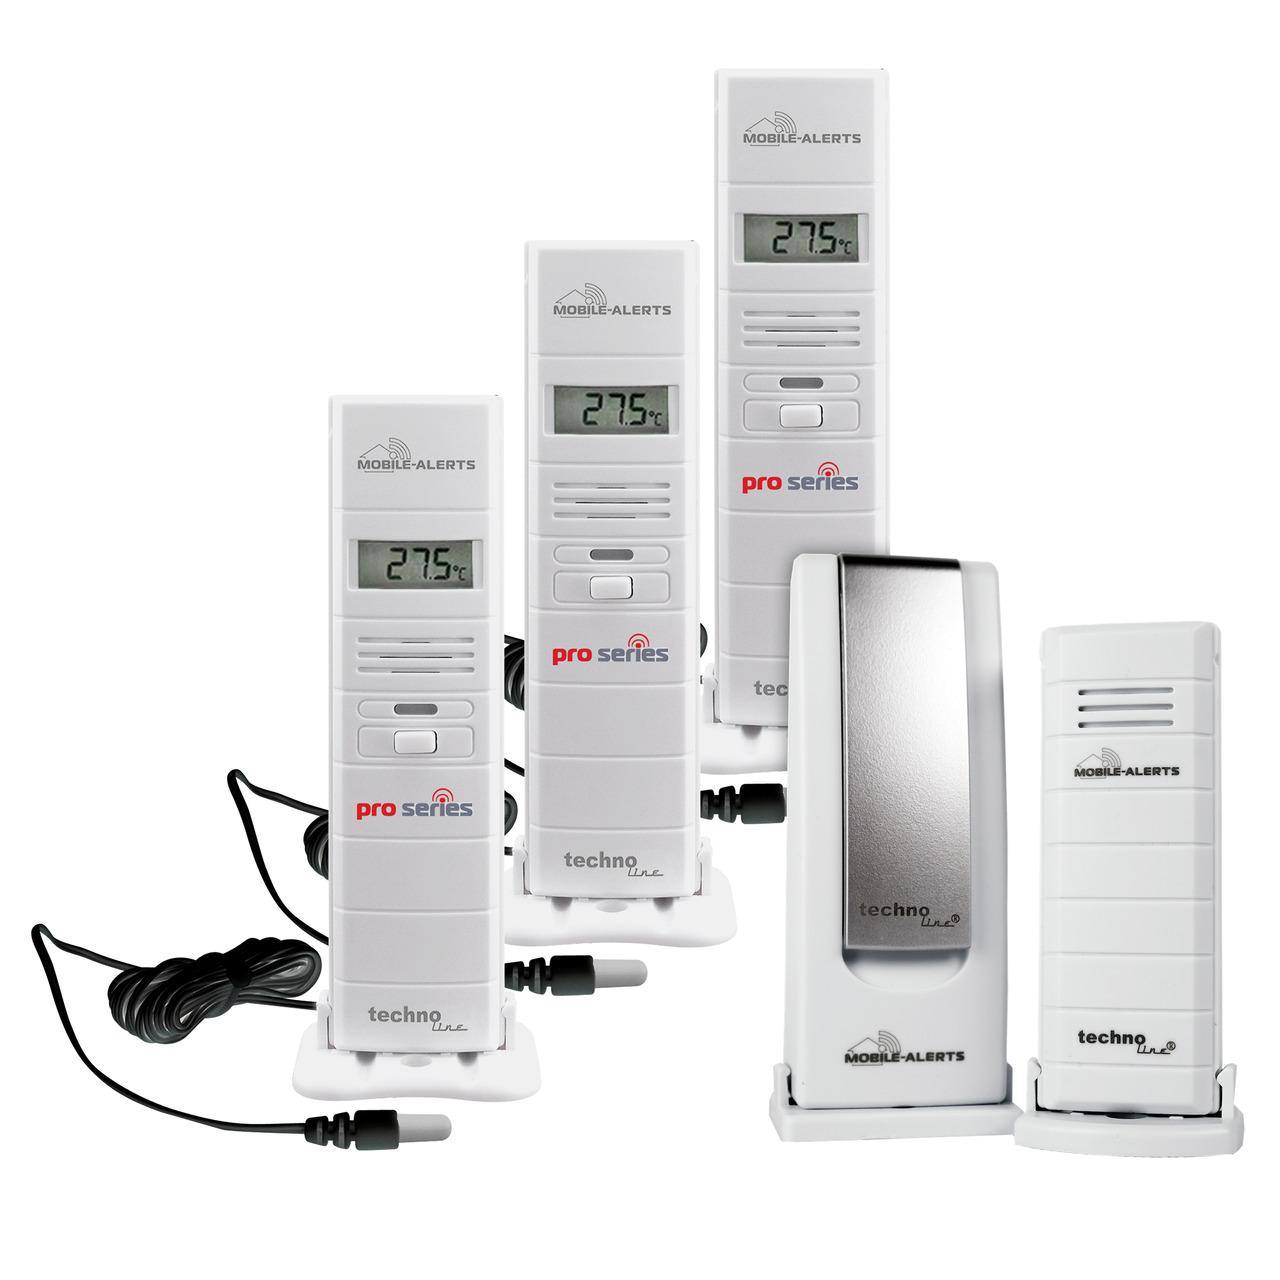 ELV Mobile Alerts Wetterset mit Gateway- Temperatursensor- 3x Thermo-Hygrosensor